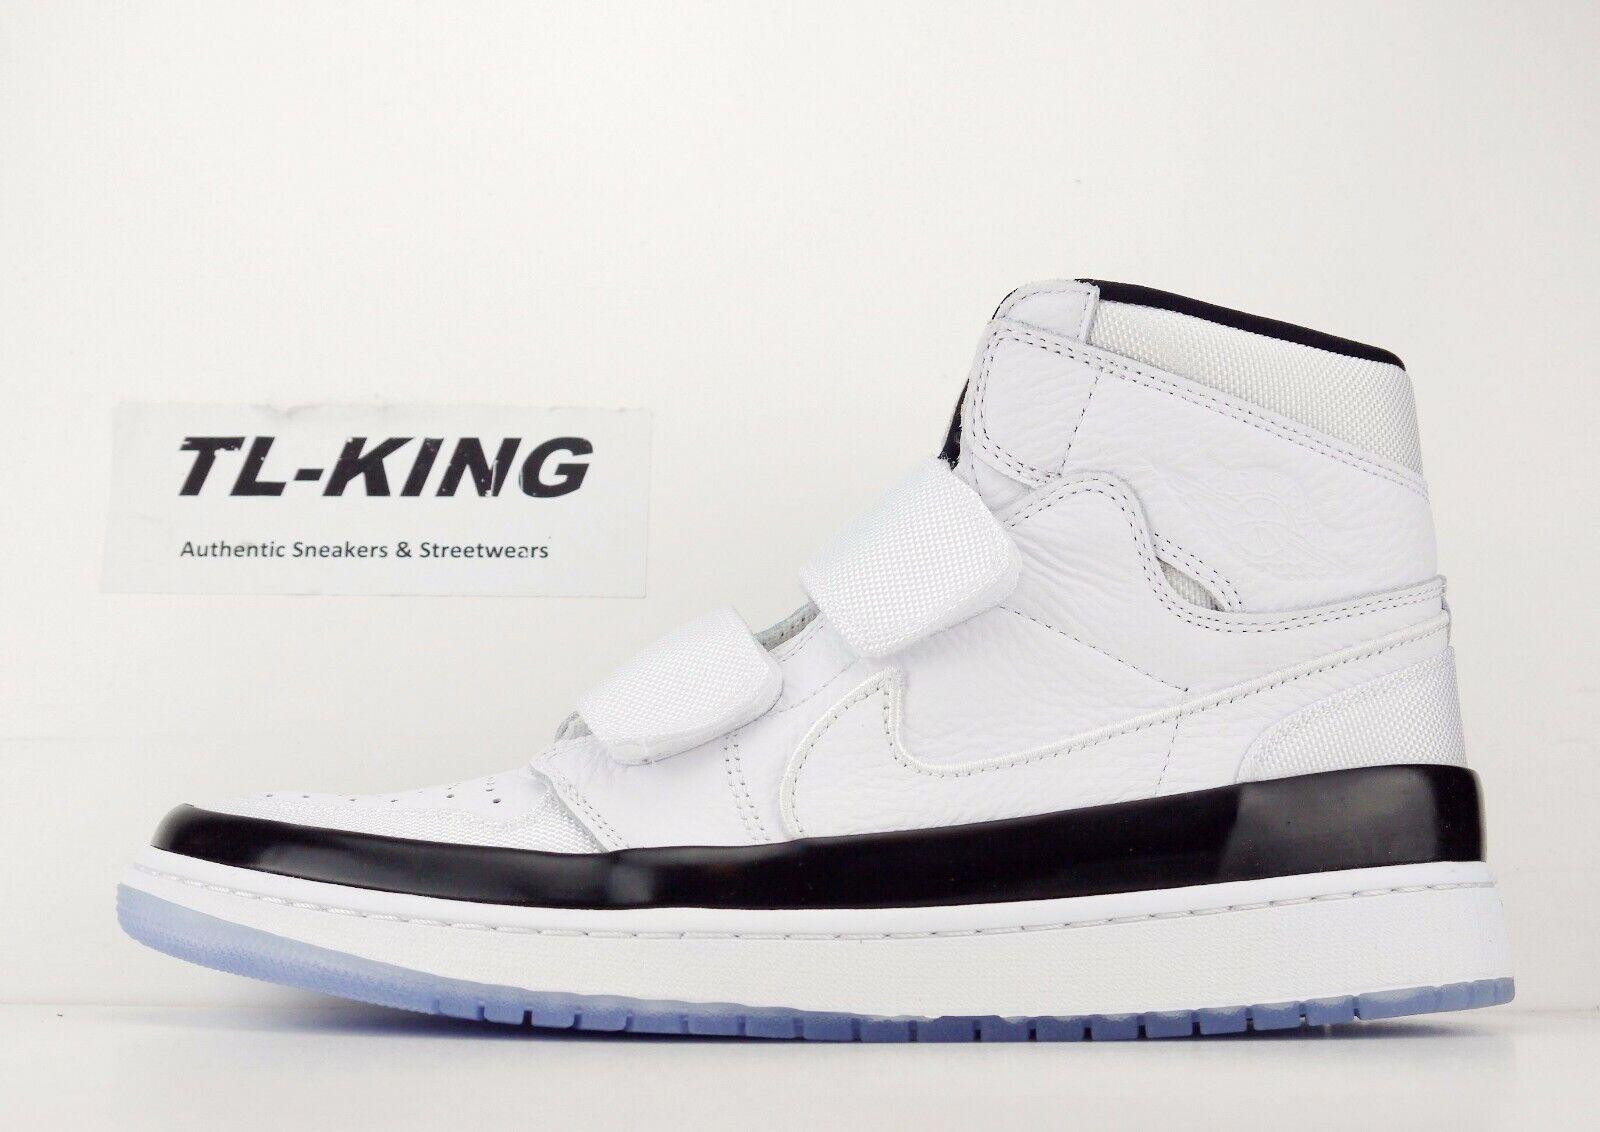 Nike Air Jordan 1 Retro High Double Strap White Dark Concord Black AQ7924 107 CB